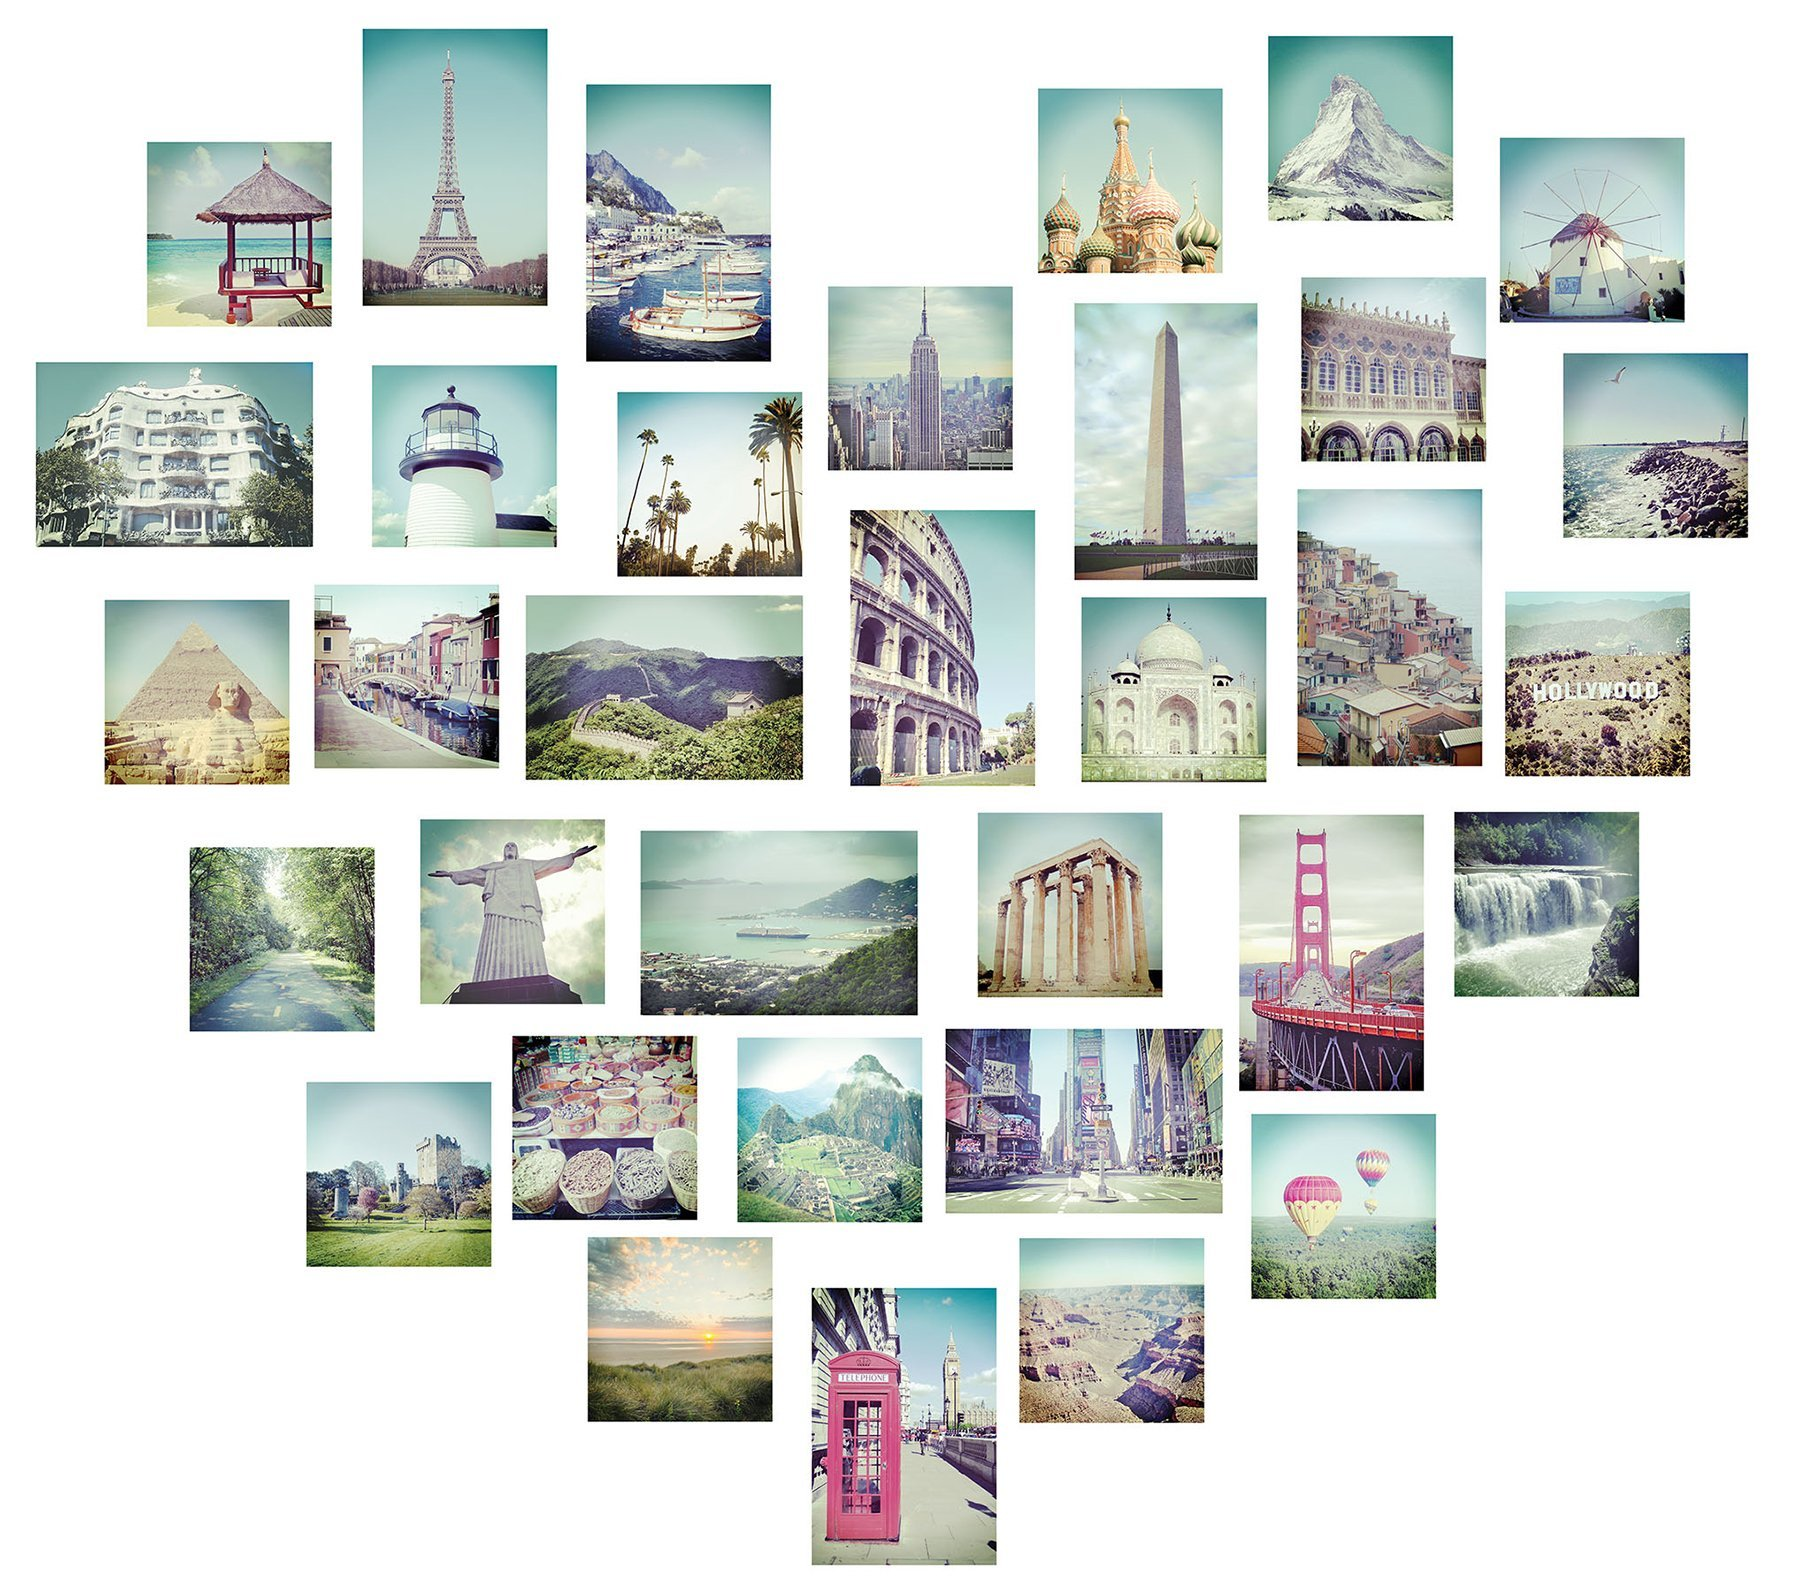 Vinilo Decorativo Pared [1GCR5Z36] imagenes ciudades corazon